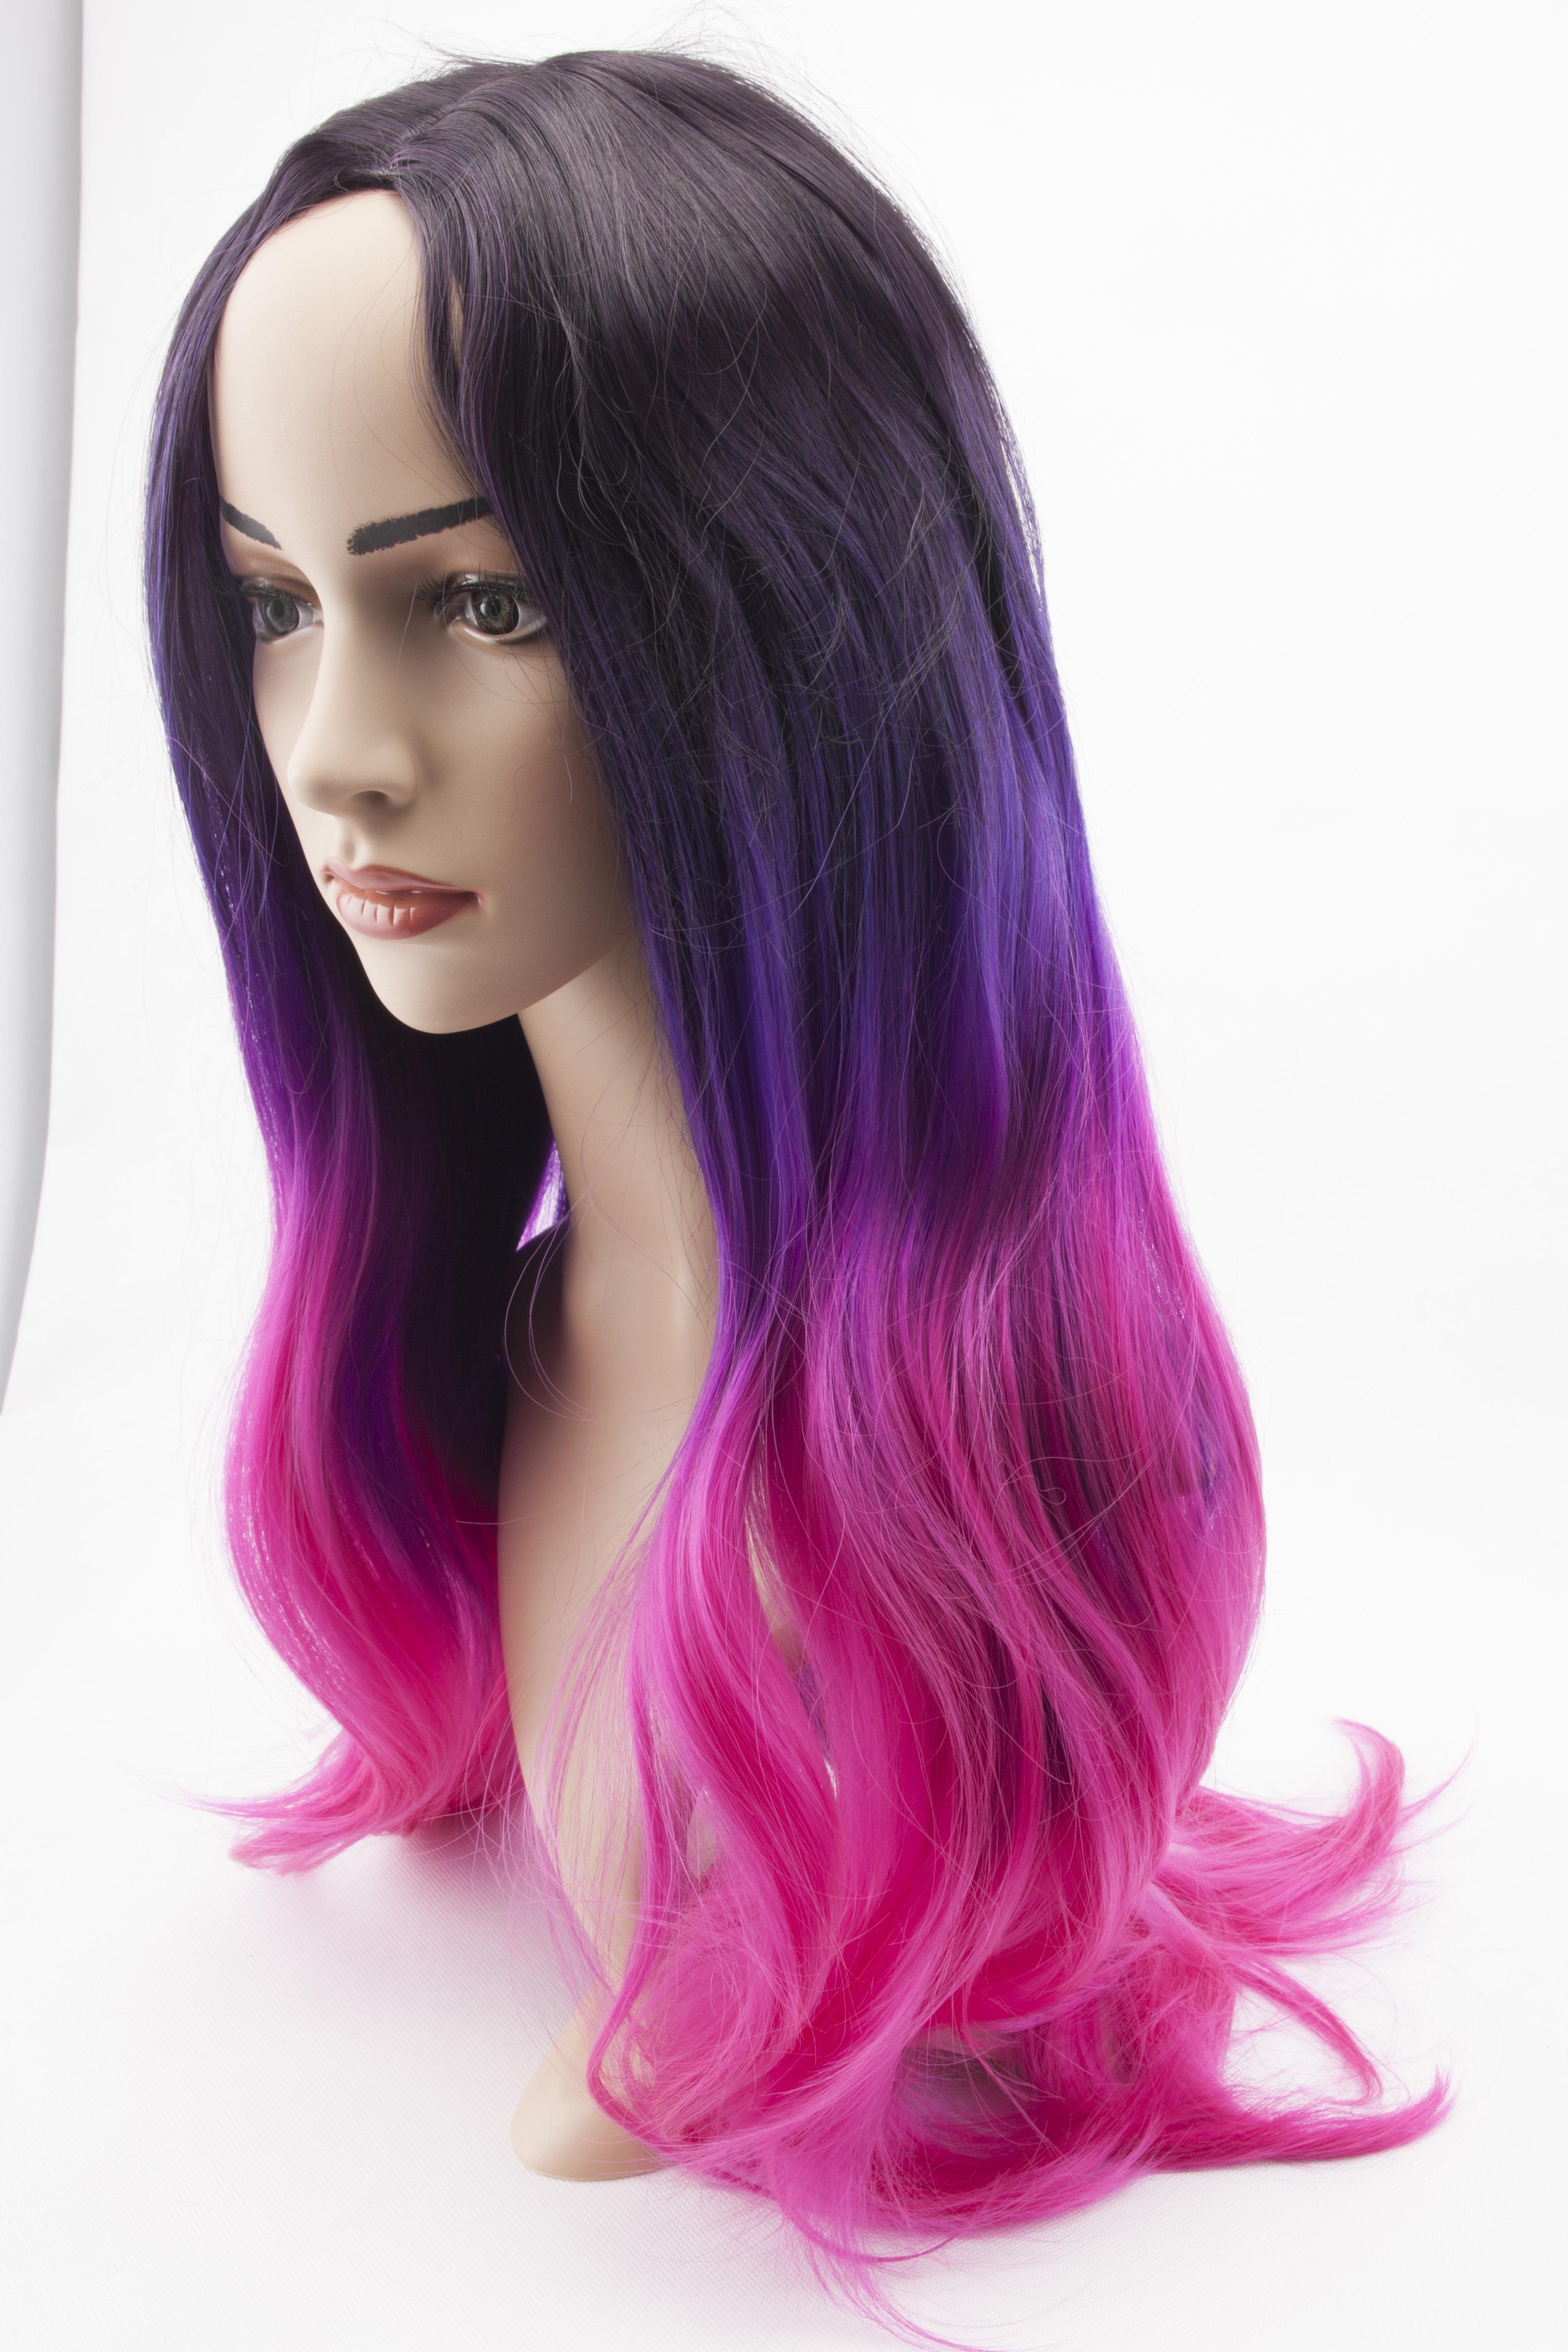 Kostenlose Foto Lila Modell Kleidung Rosa Frisur Lange Haare